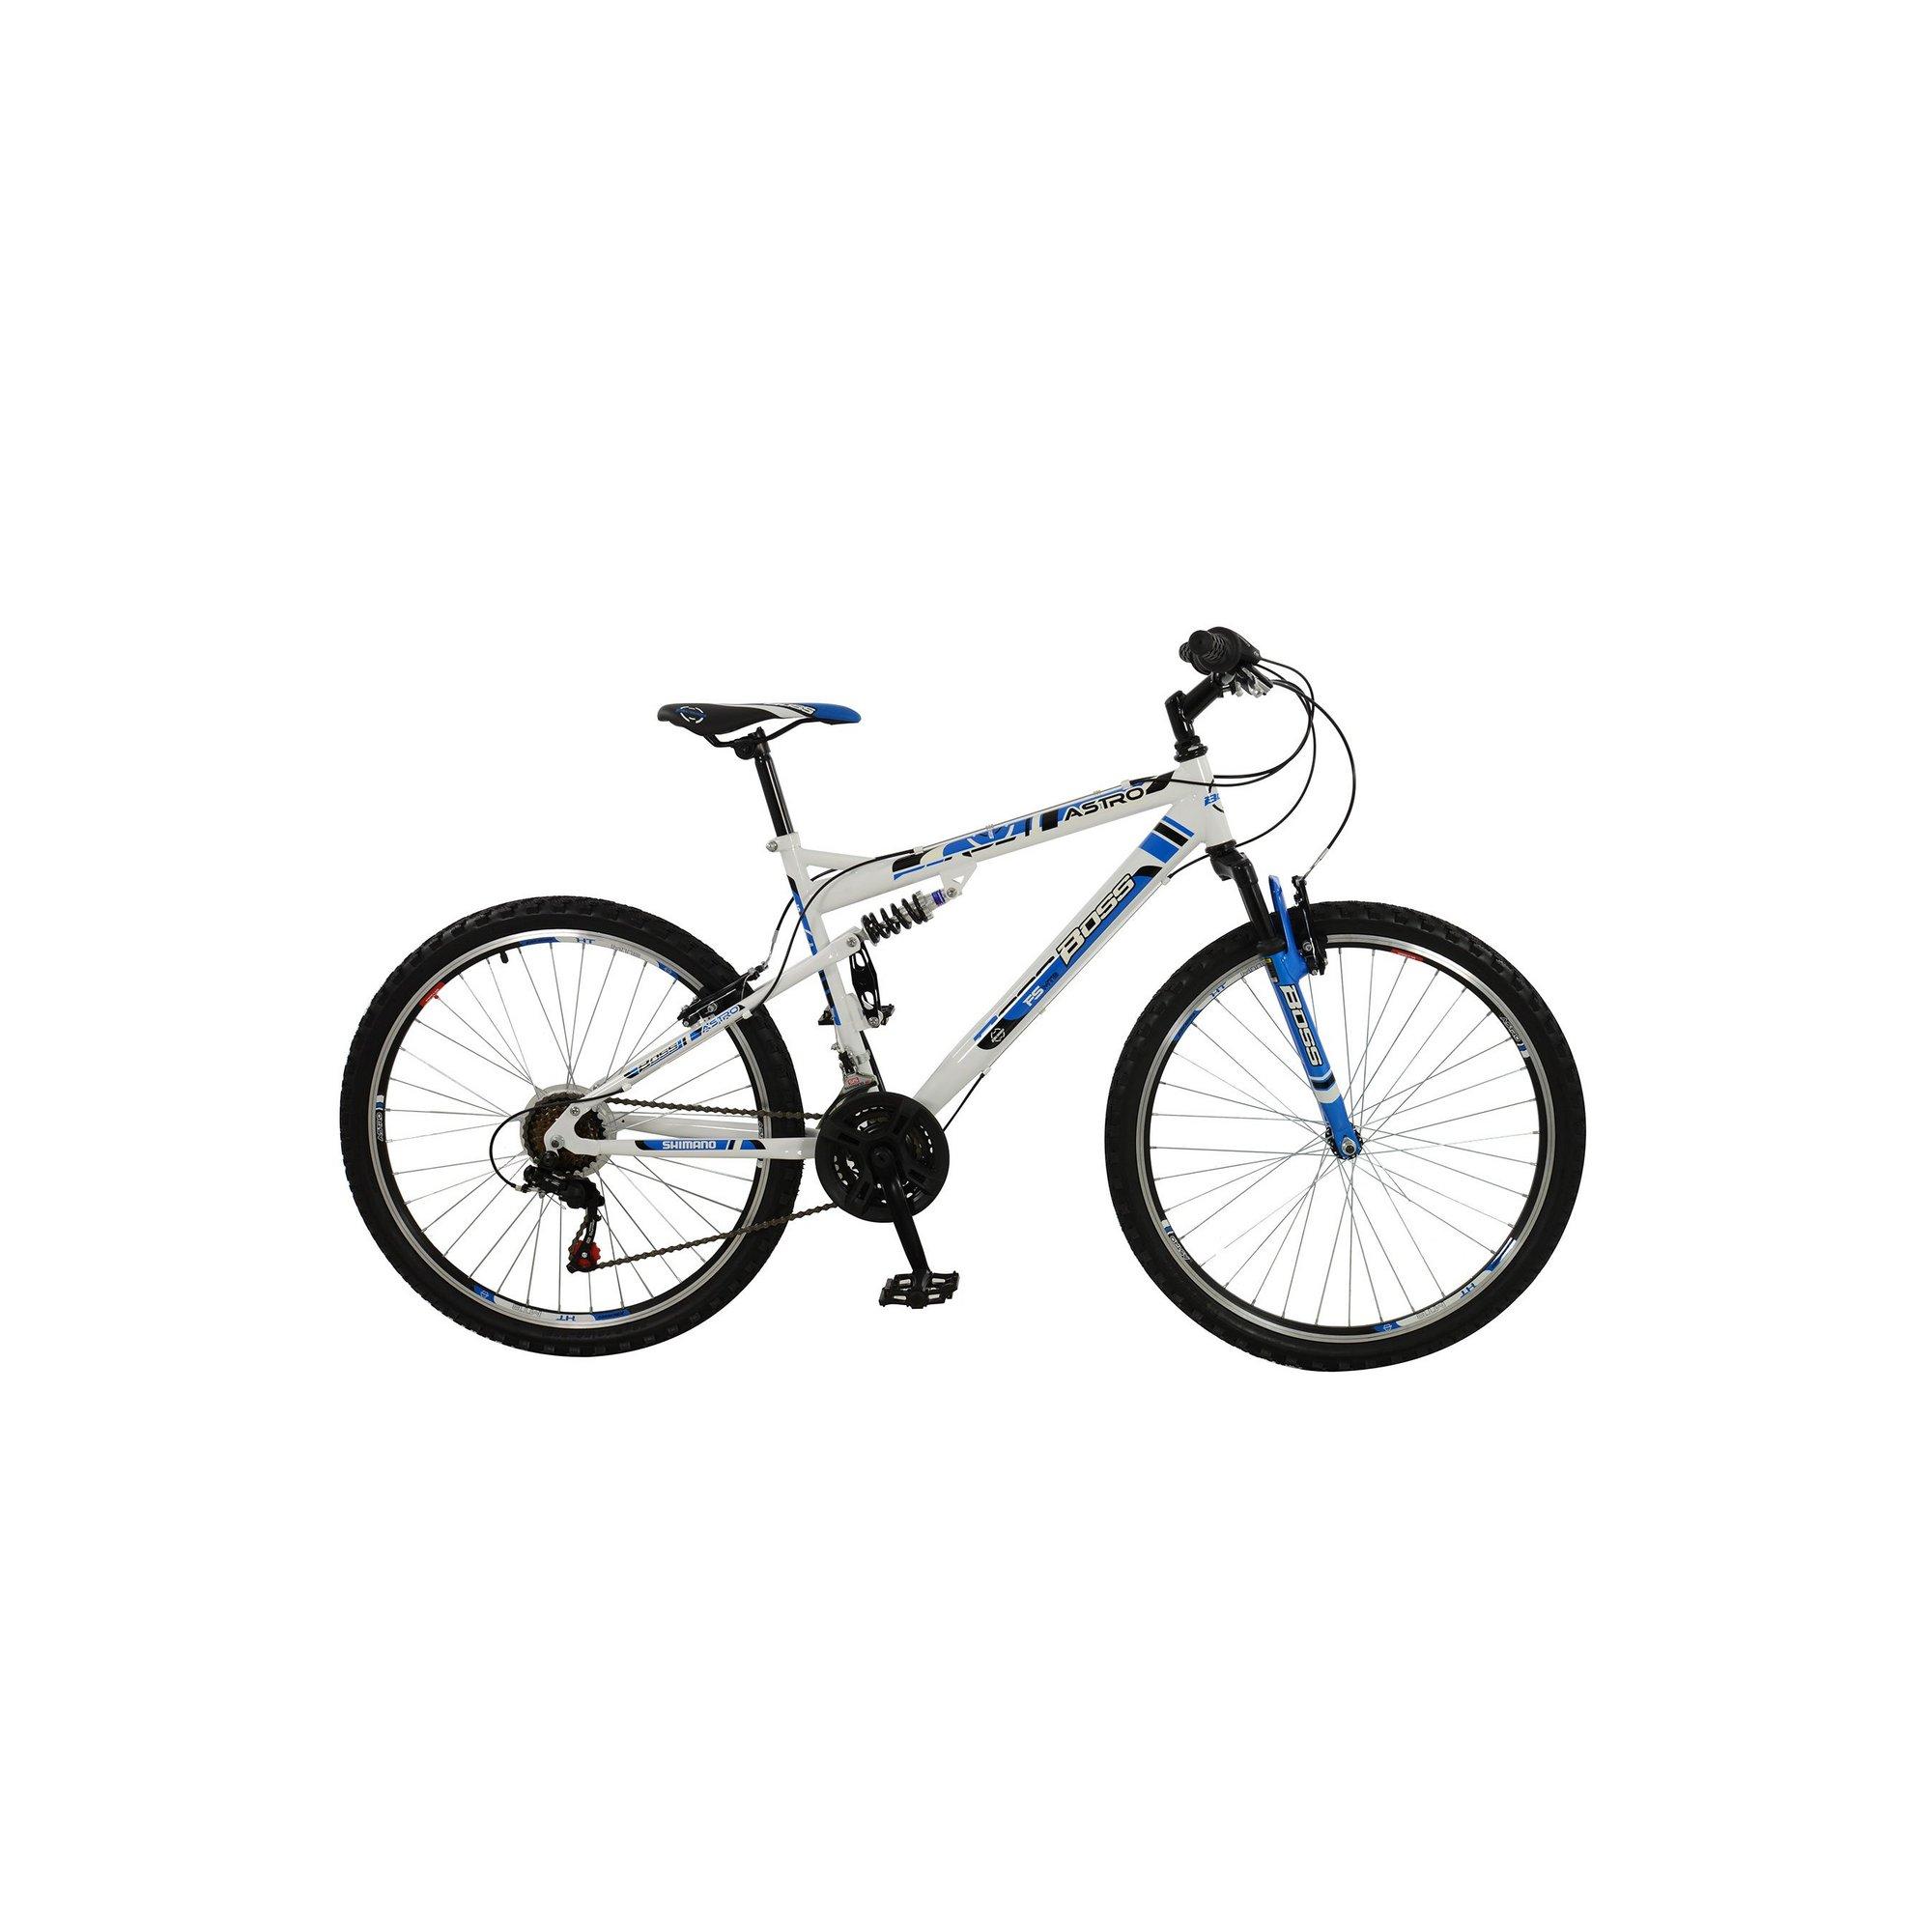 Image of Boss Astro 18 Inch Bike